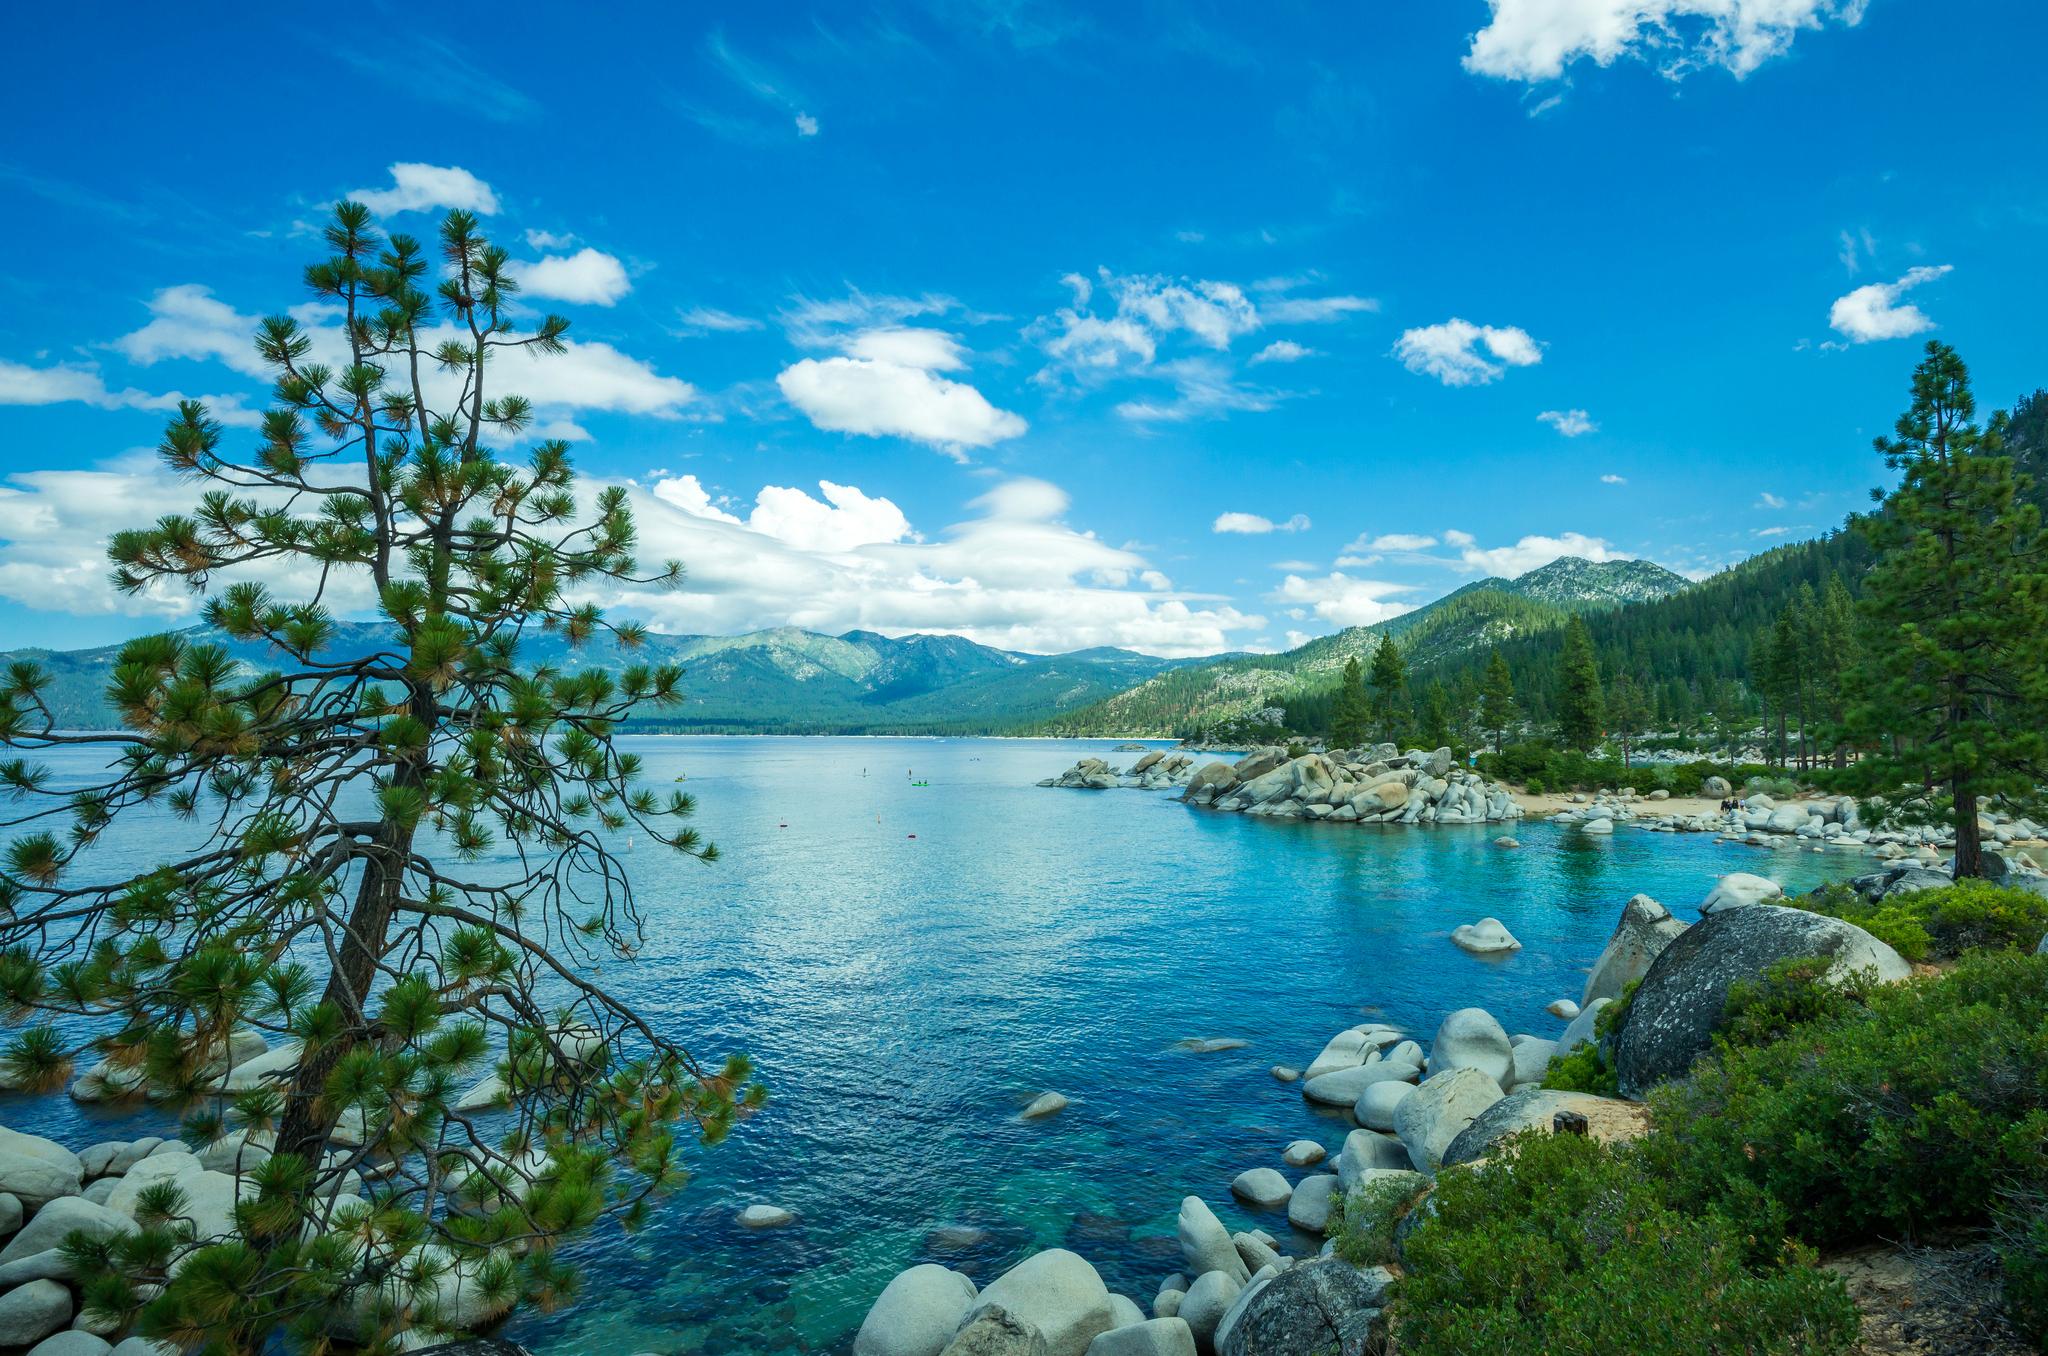 Lake Tahoe HD Wallpaper